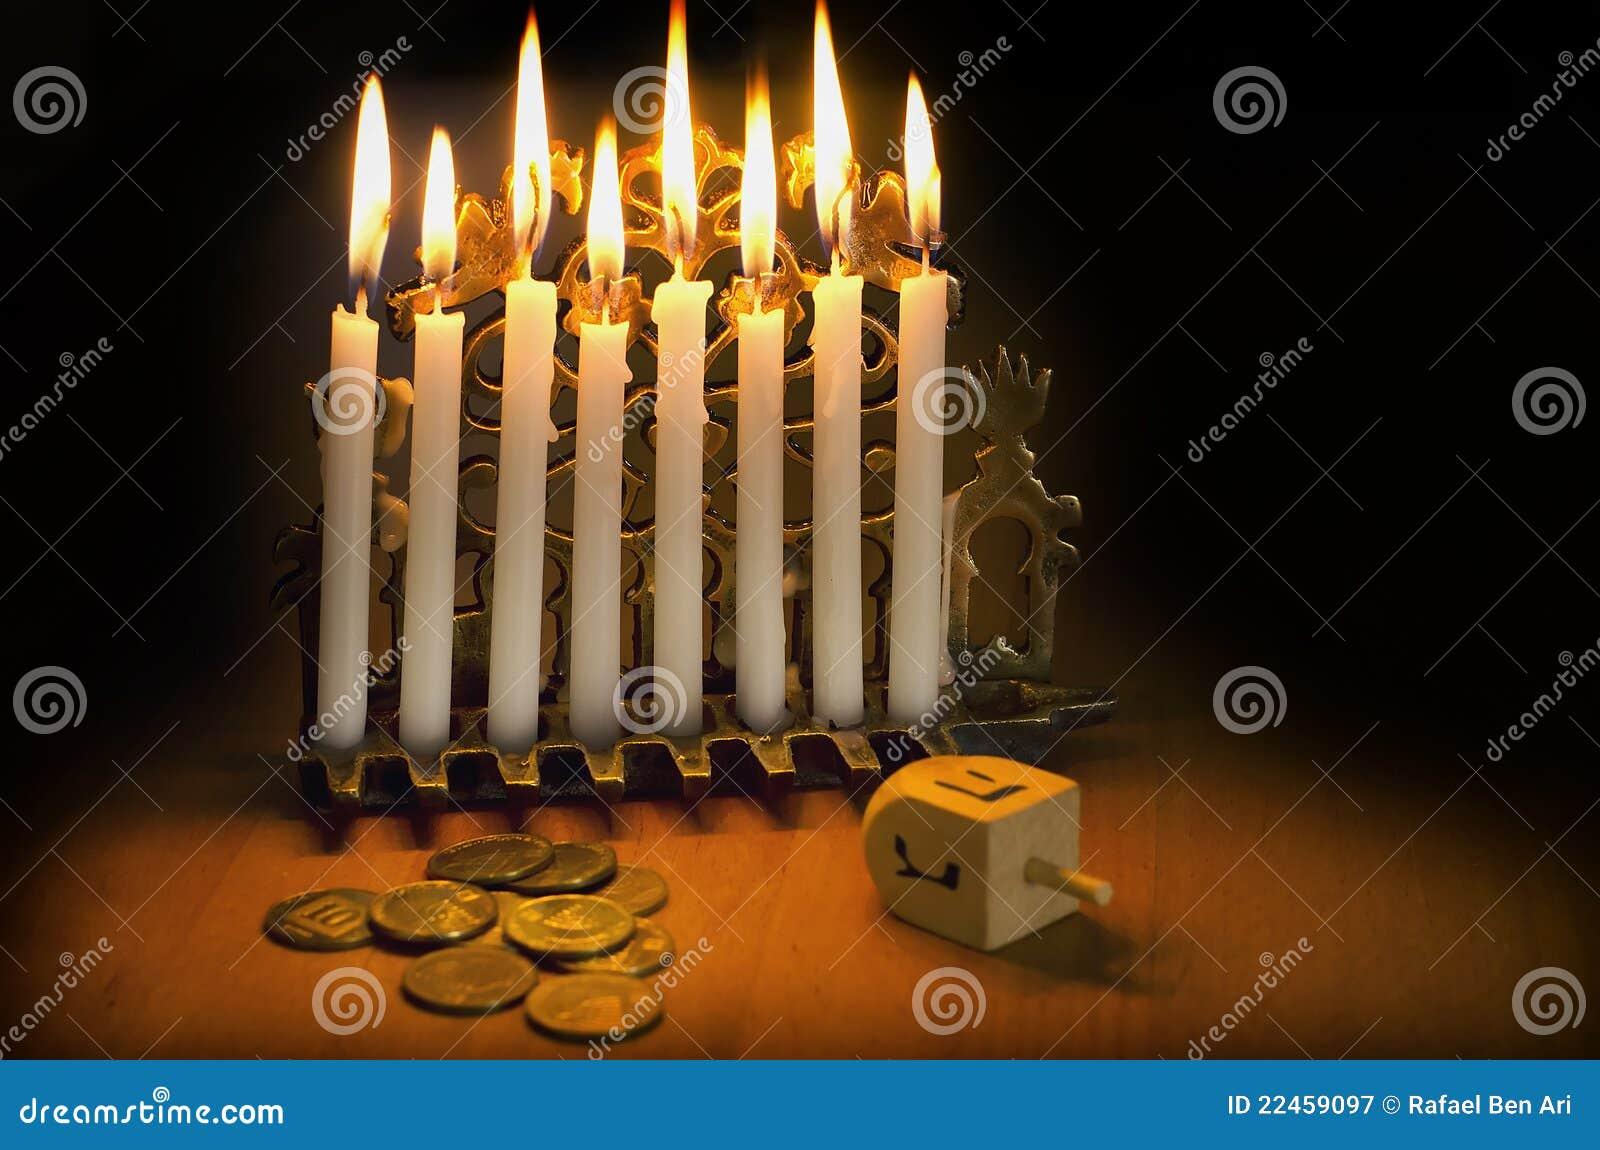 Jewish Holiday Hanukkah Stock Image Image Of Hannukah